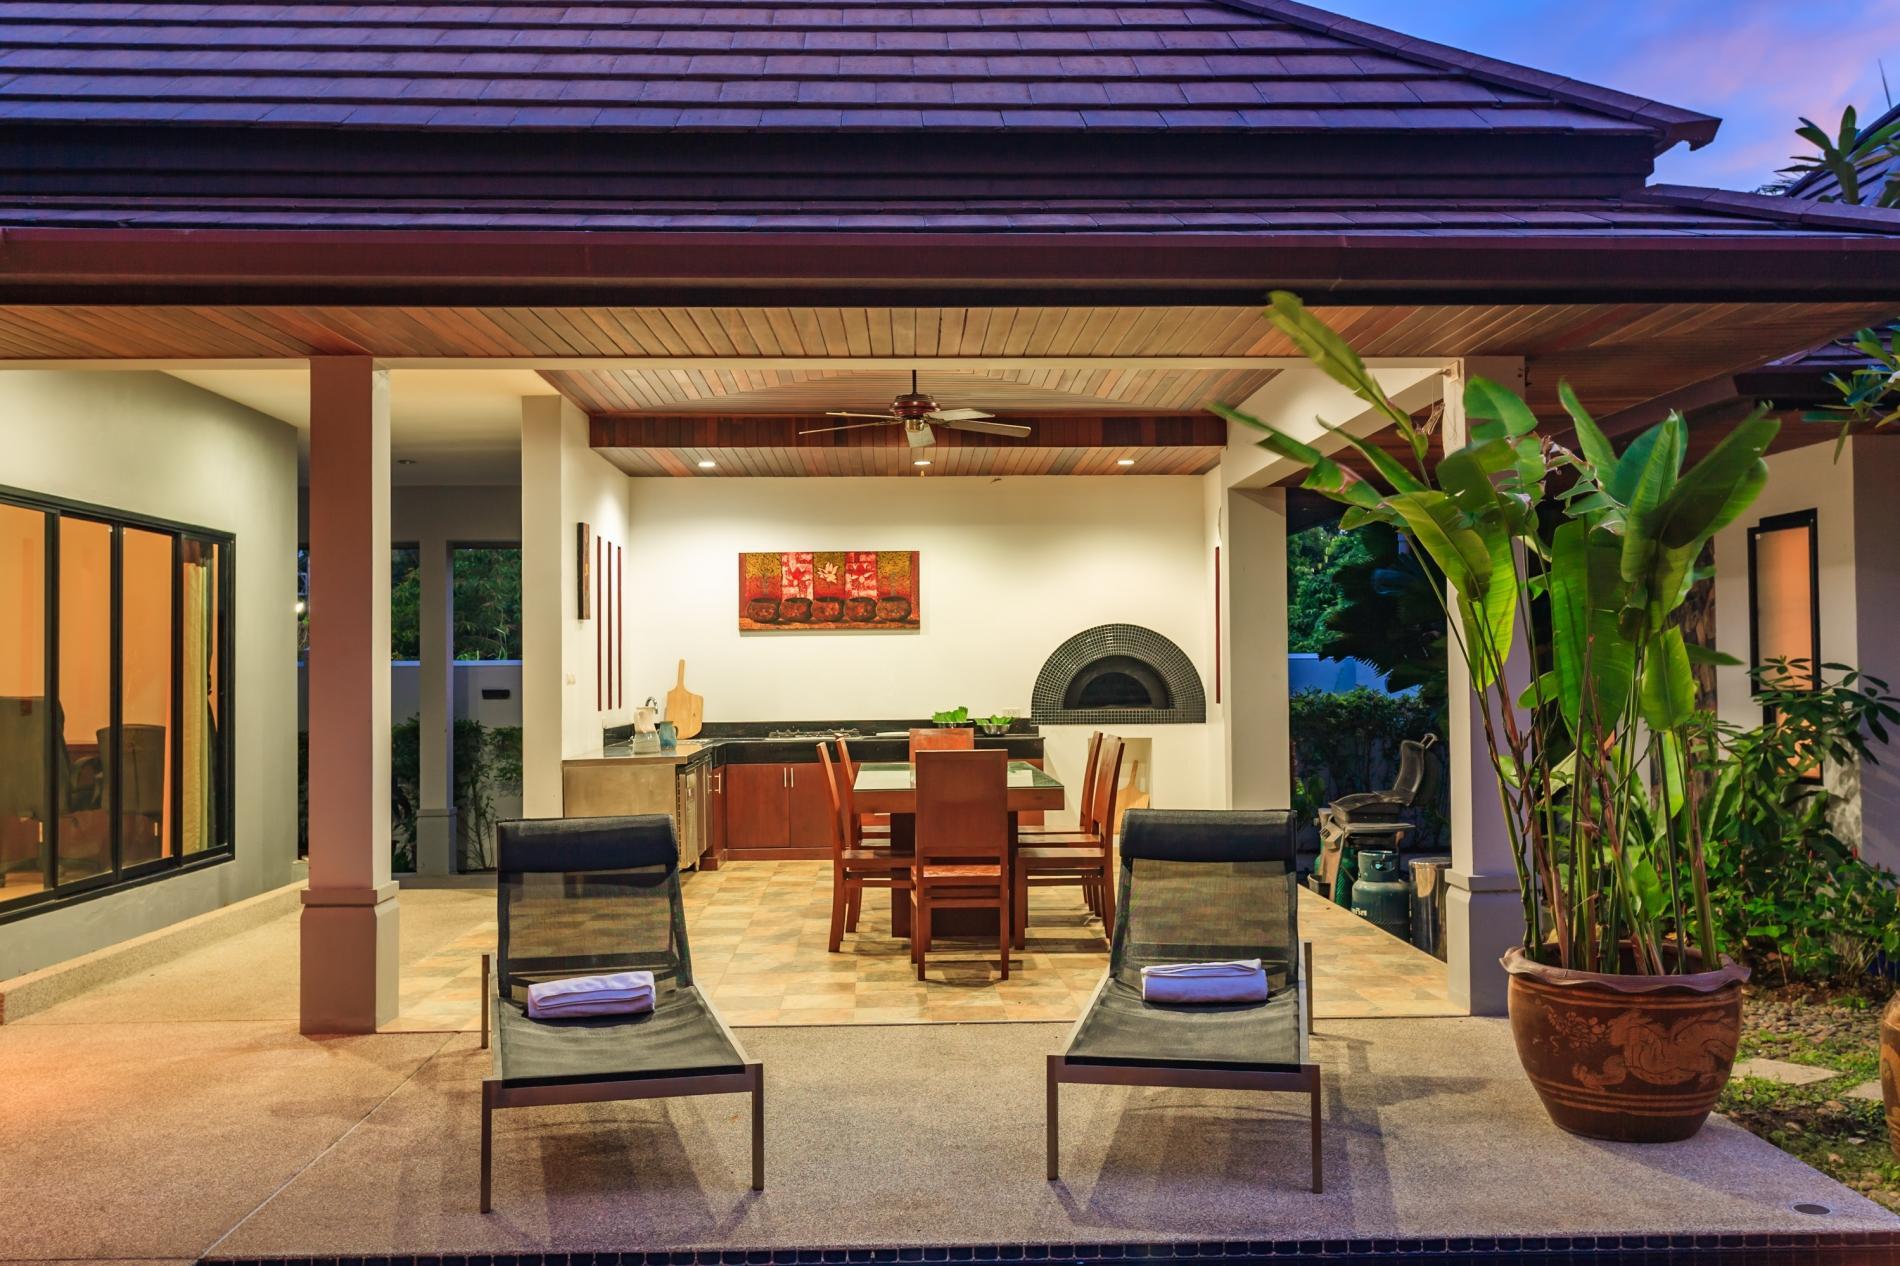 Frangipani Villa in Nai Harn - 5 bedroom private pool with garden and pizza oven photo 20389699